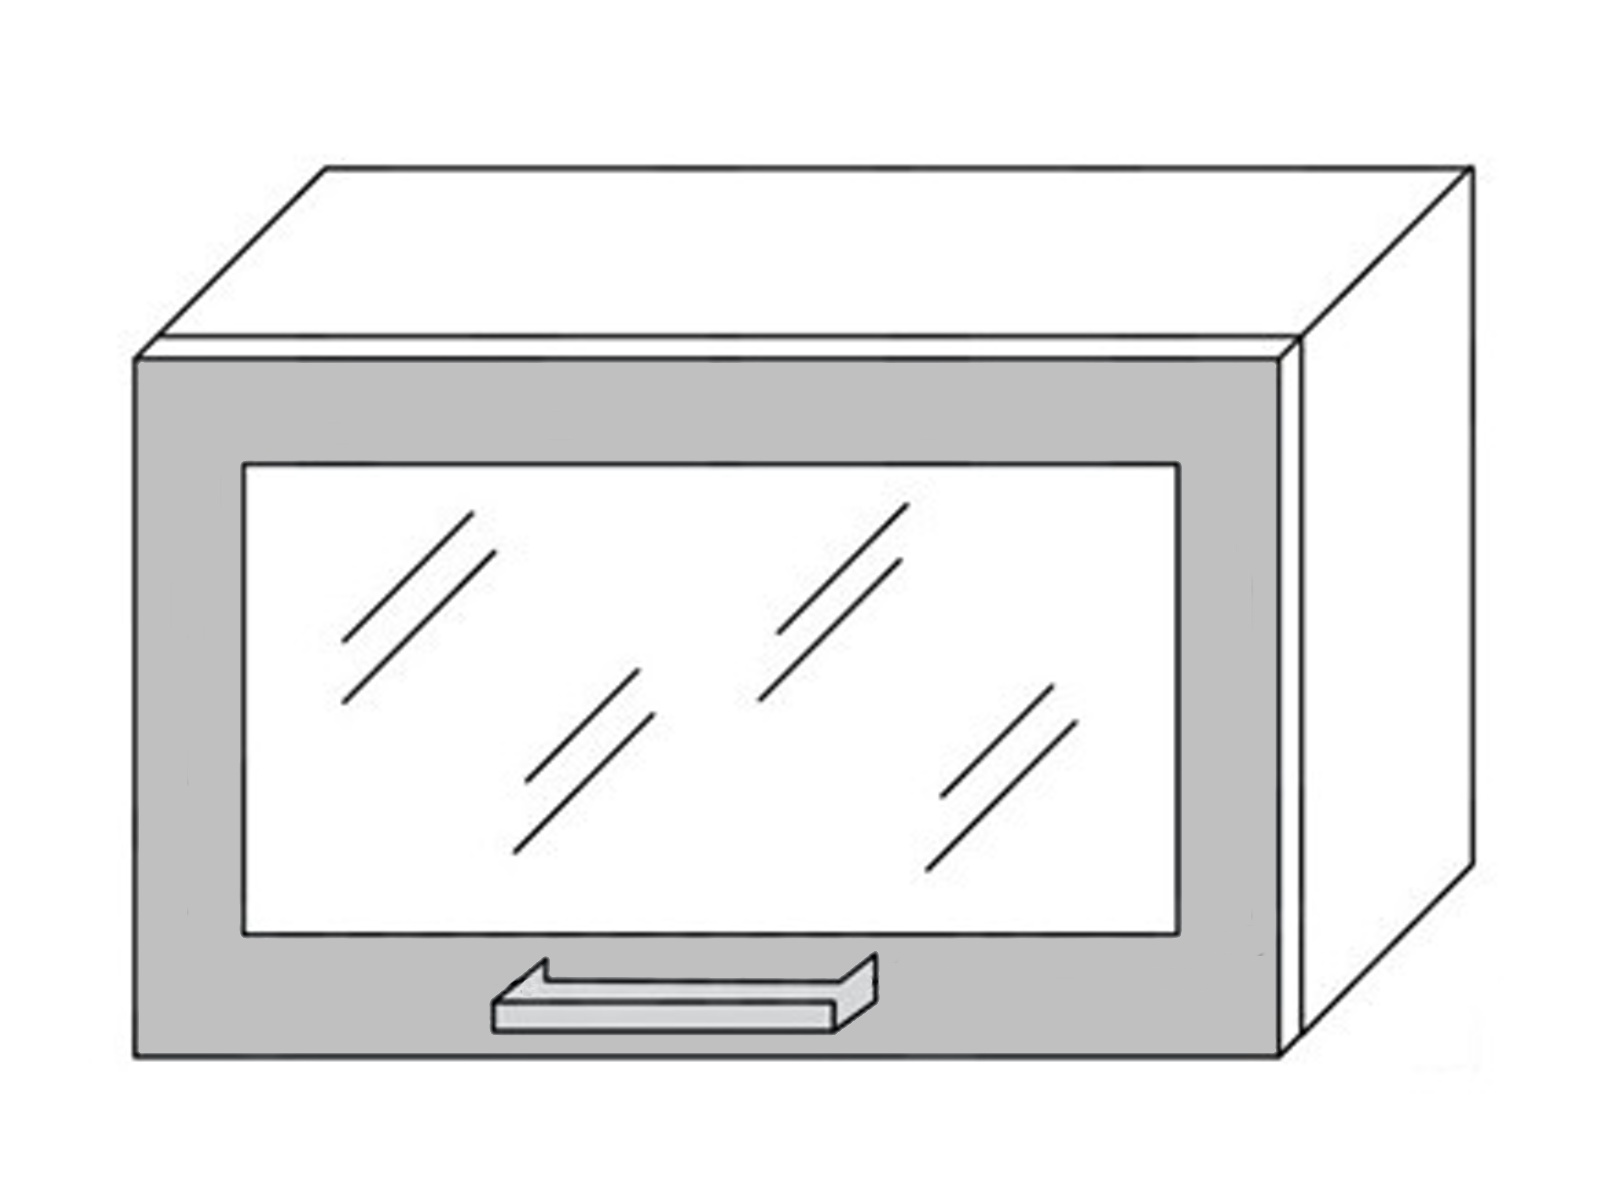 Extom TITANIUM, skříňka horní prosklená W4bs 60 ALU, korpus: jersey